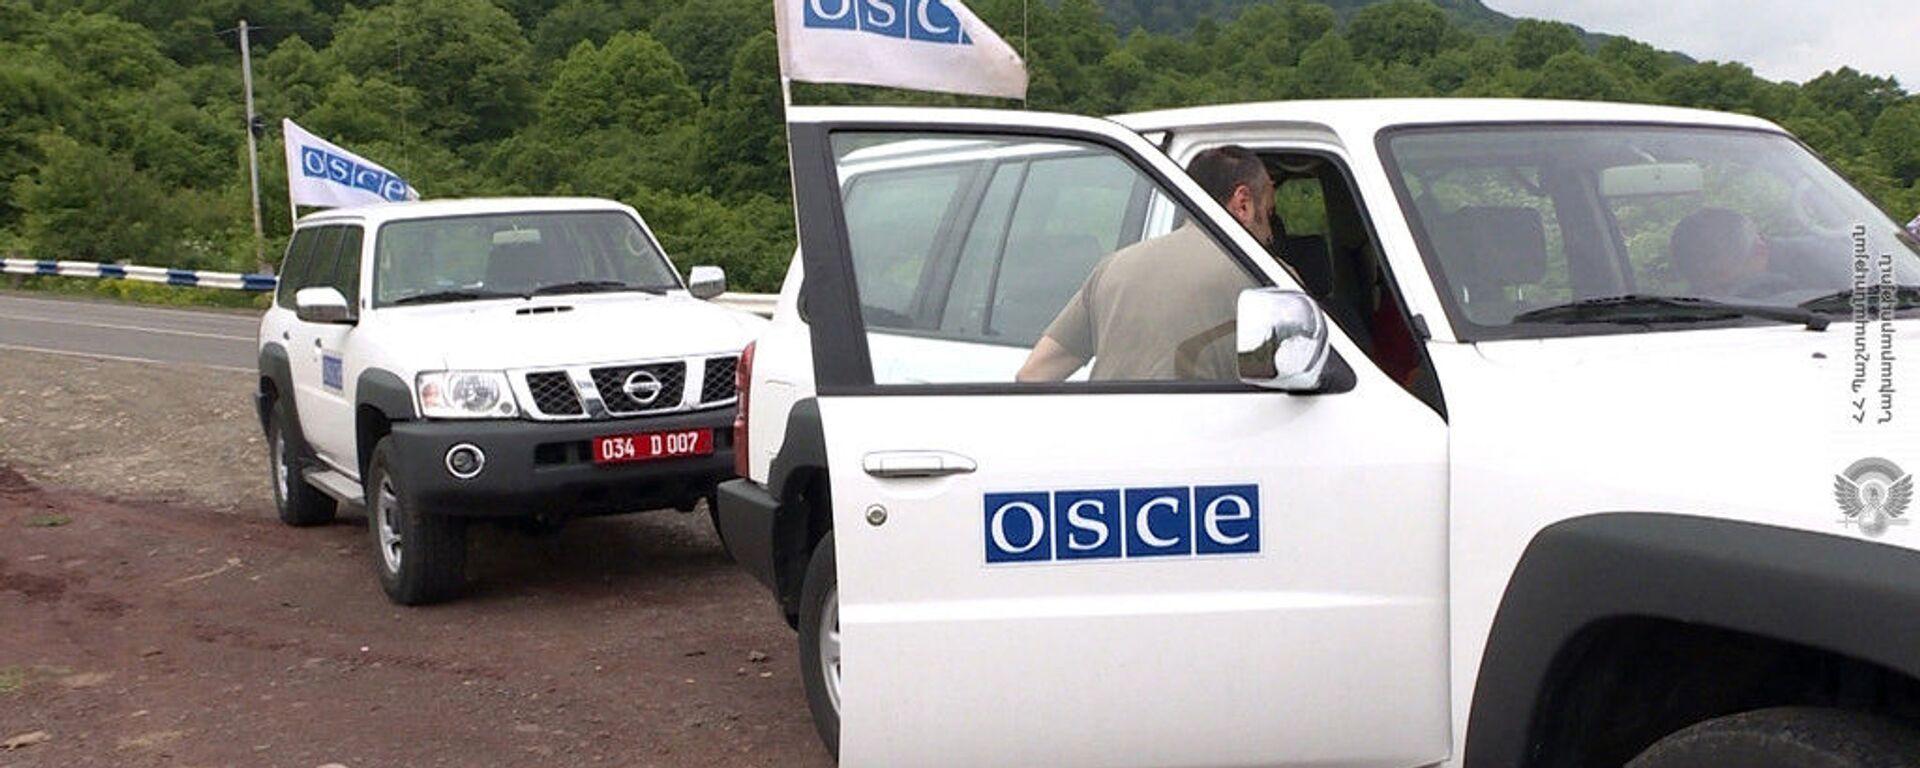 Мониторинг ОБСЕ на армяно-азербайджанской границе - Sputnik Արմենիա, 1920, 08.10.2021